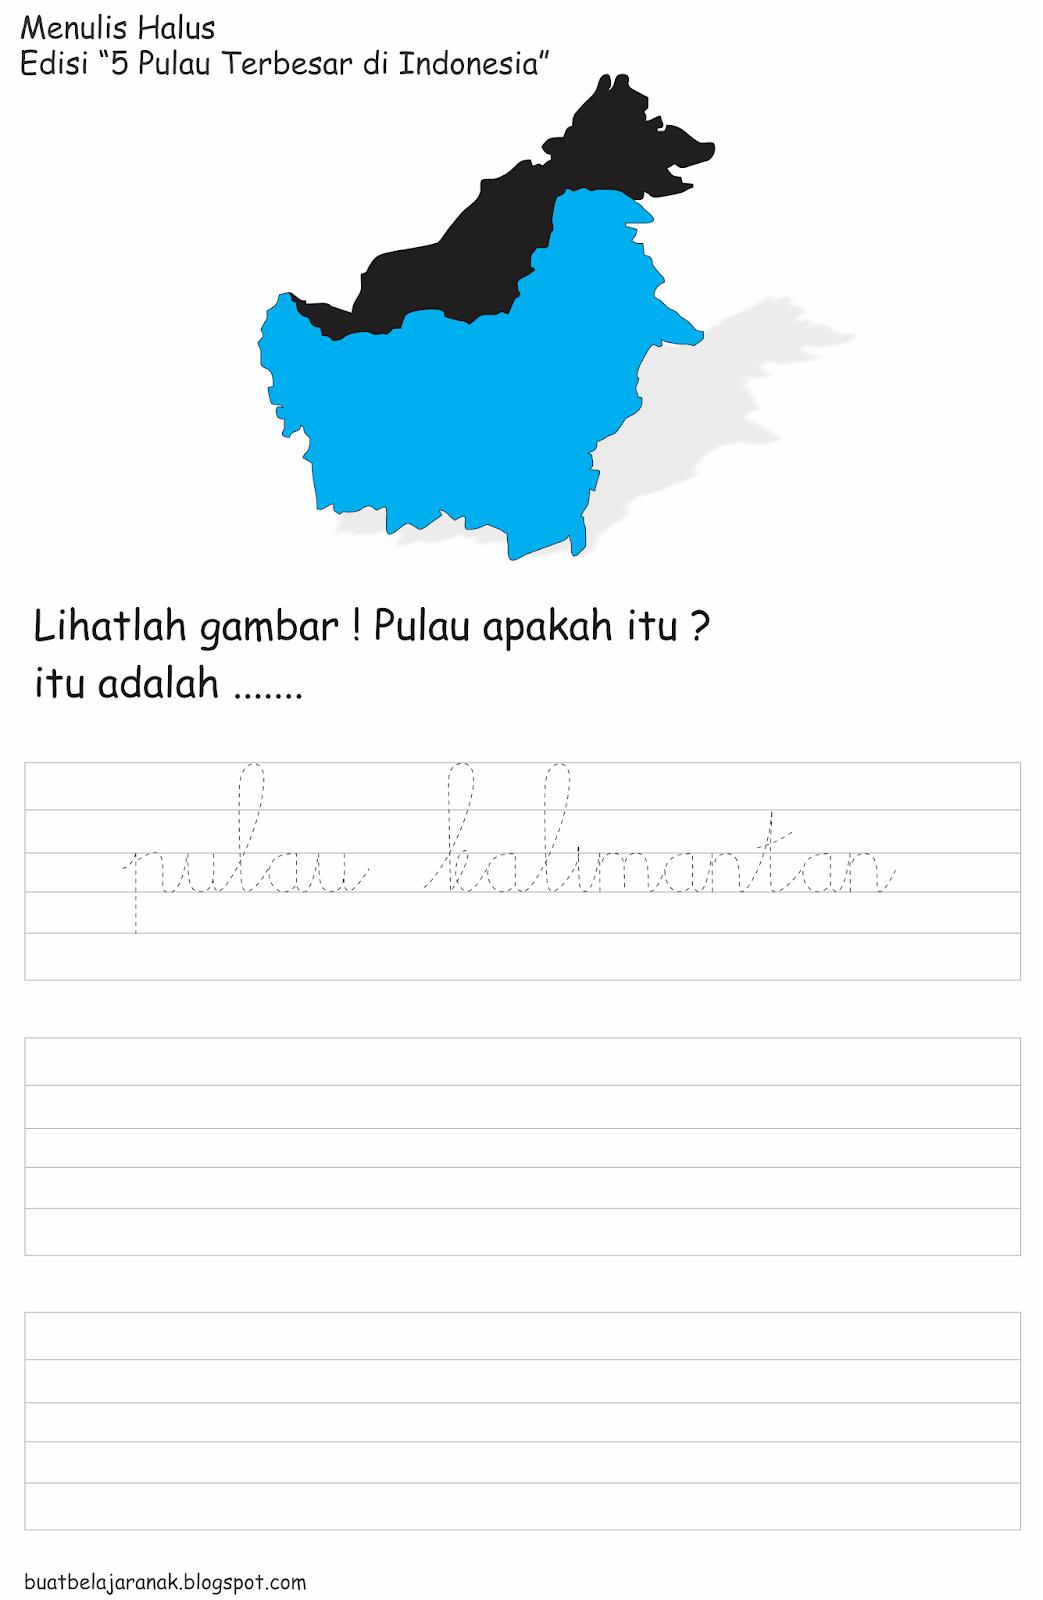 Lembar Kerja Menulis Tegak Bersambung Edisi 5 Pulau